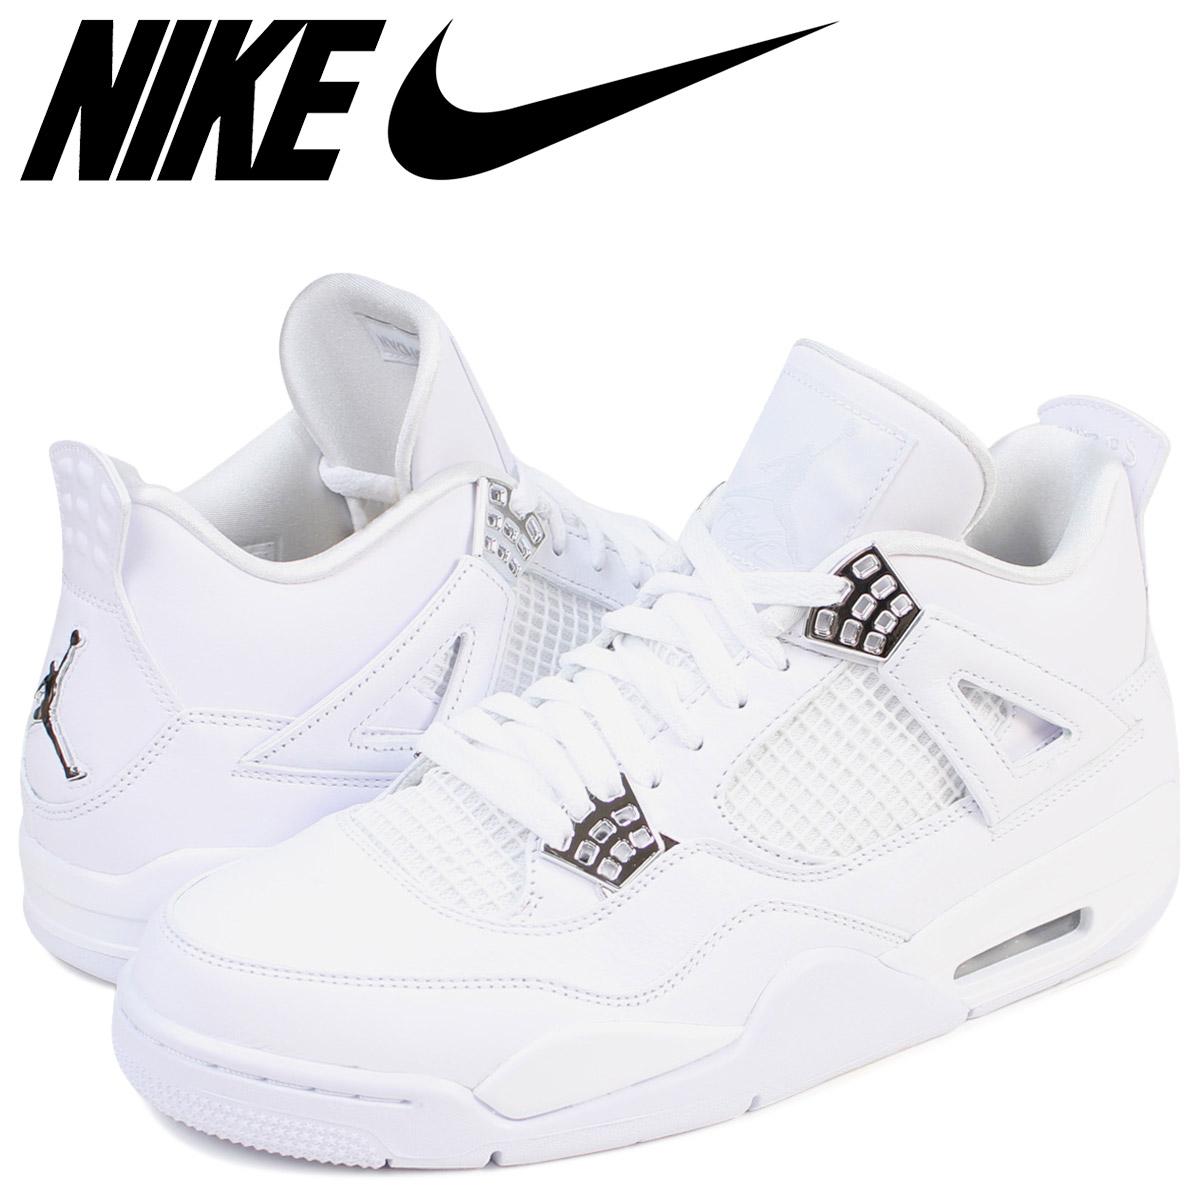 1abce1873609e NIKE Nike Air Jordan 4 nostalgic sneakers AIR JORDAN 4 RETRO 308,497-100 men's  shoes ...